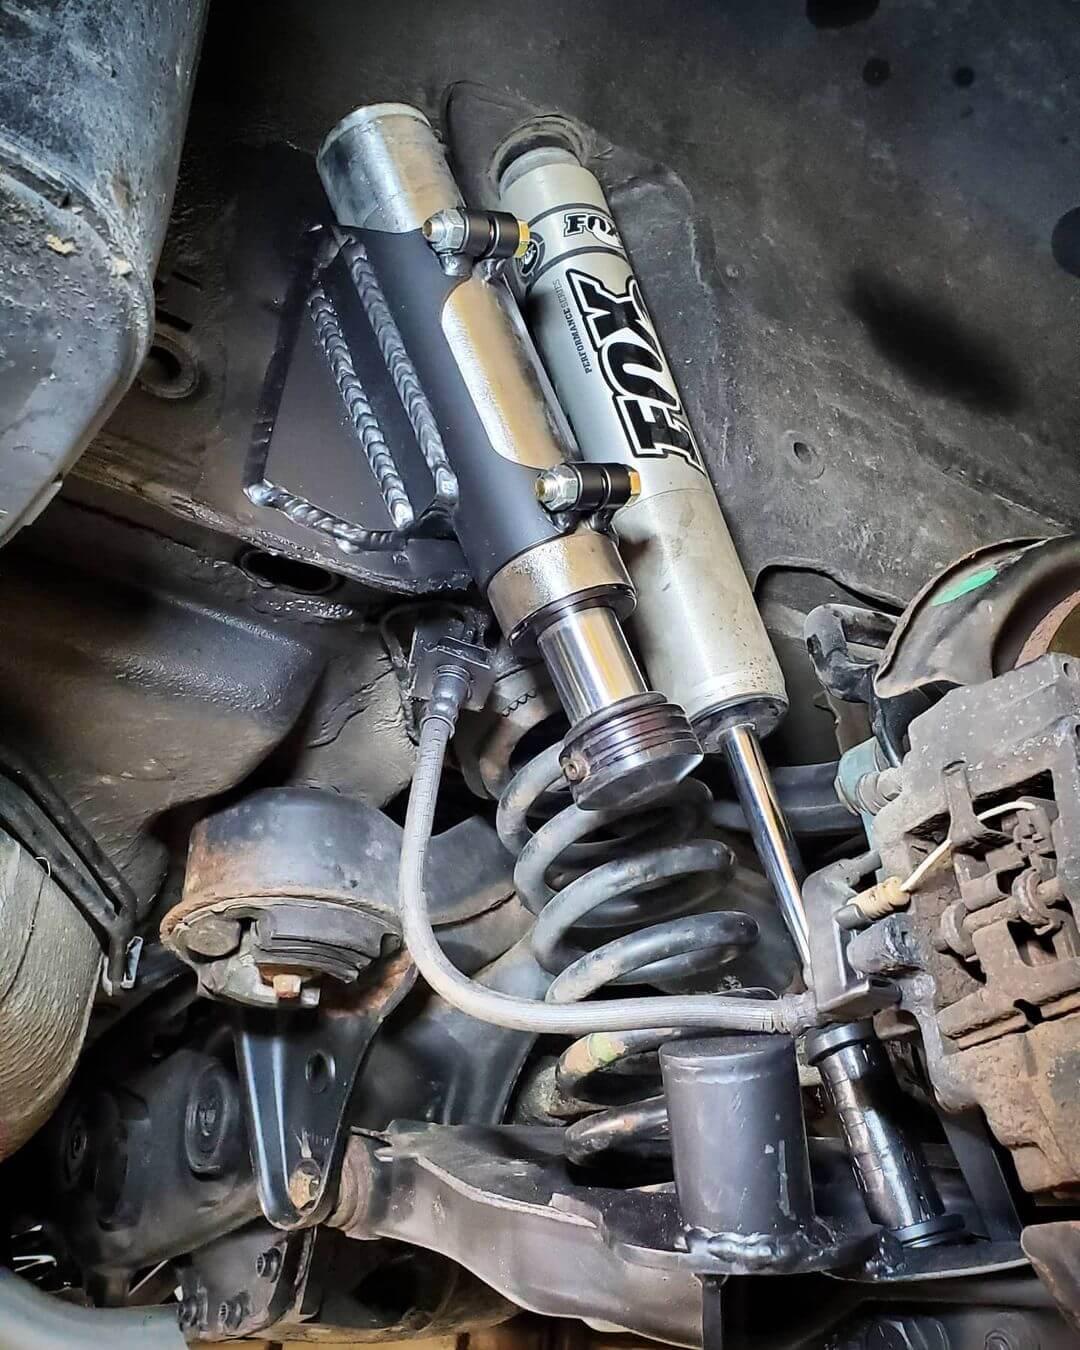 Long Travel suspension with Fox Shocks